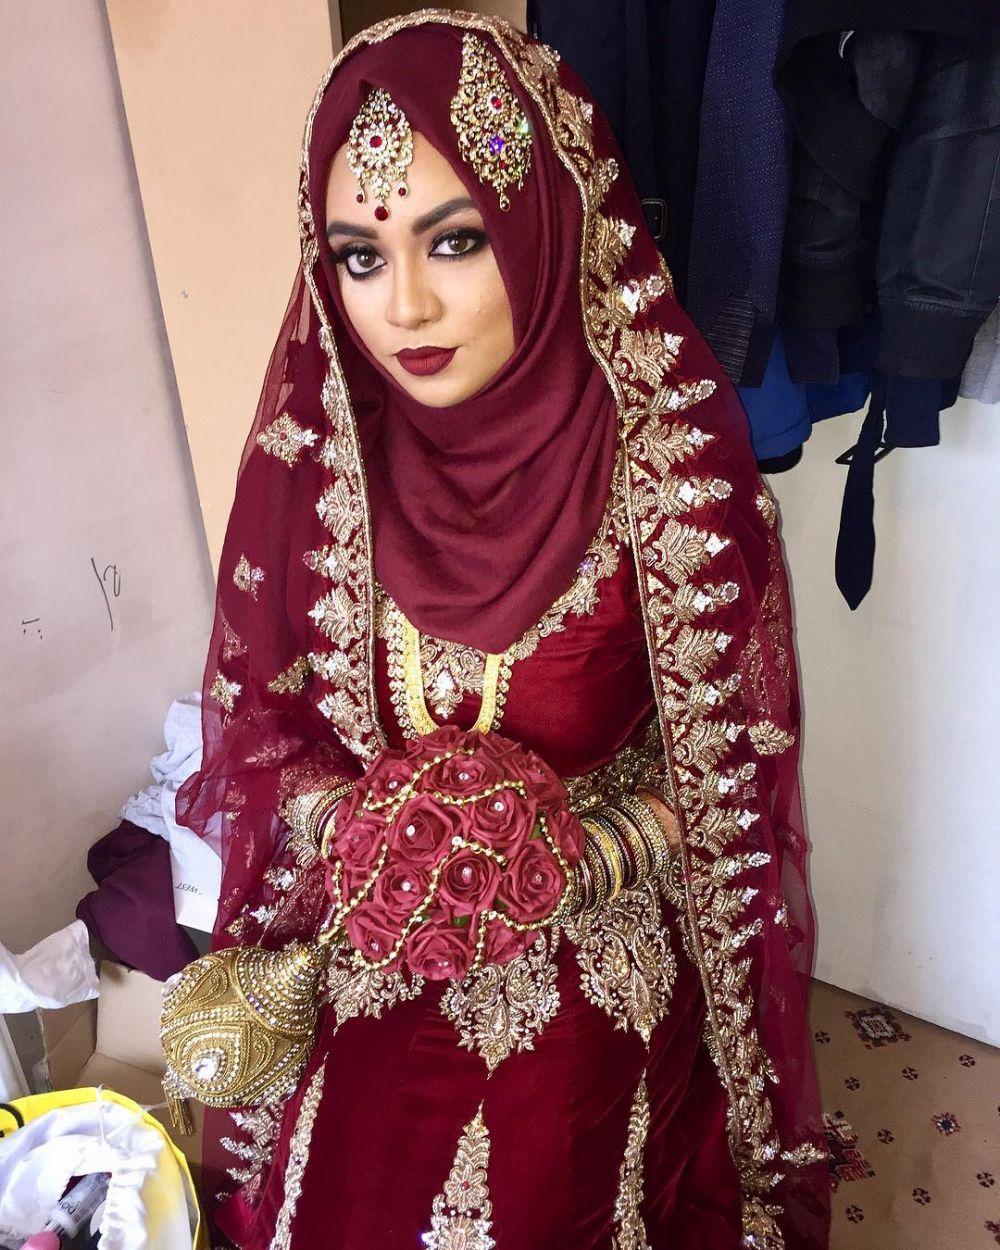 20 inspirasi riasan pengantin ala india untuk wanita berhijab